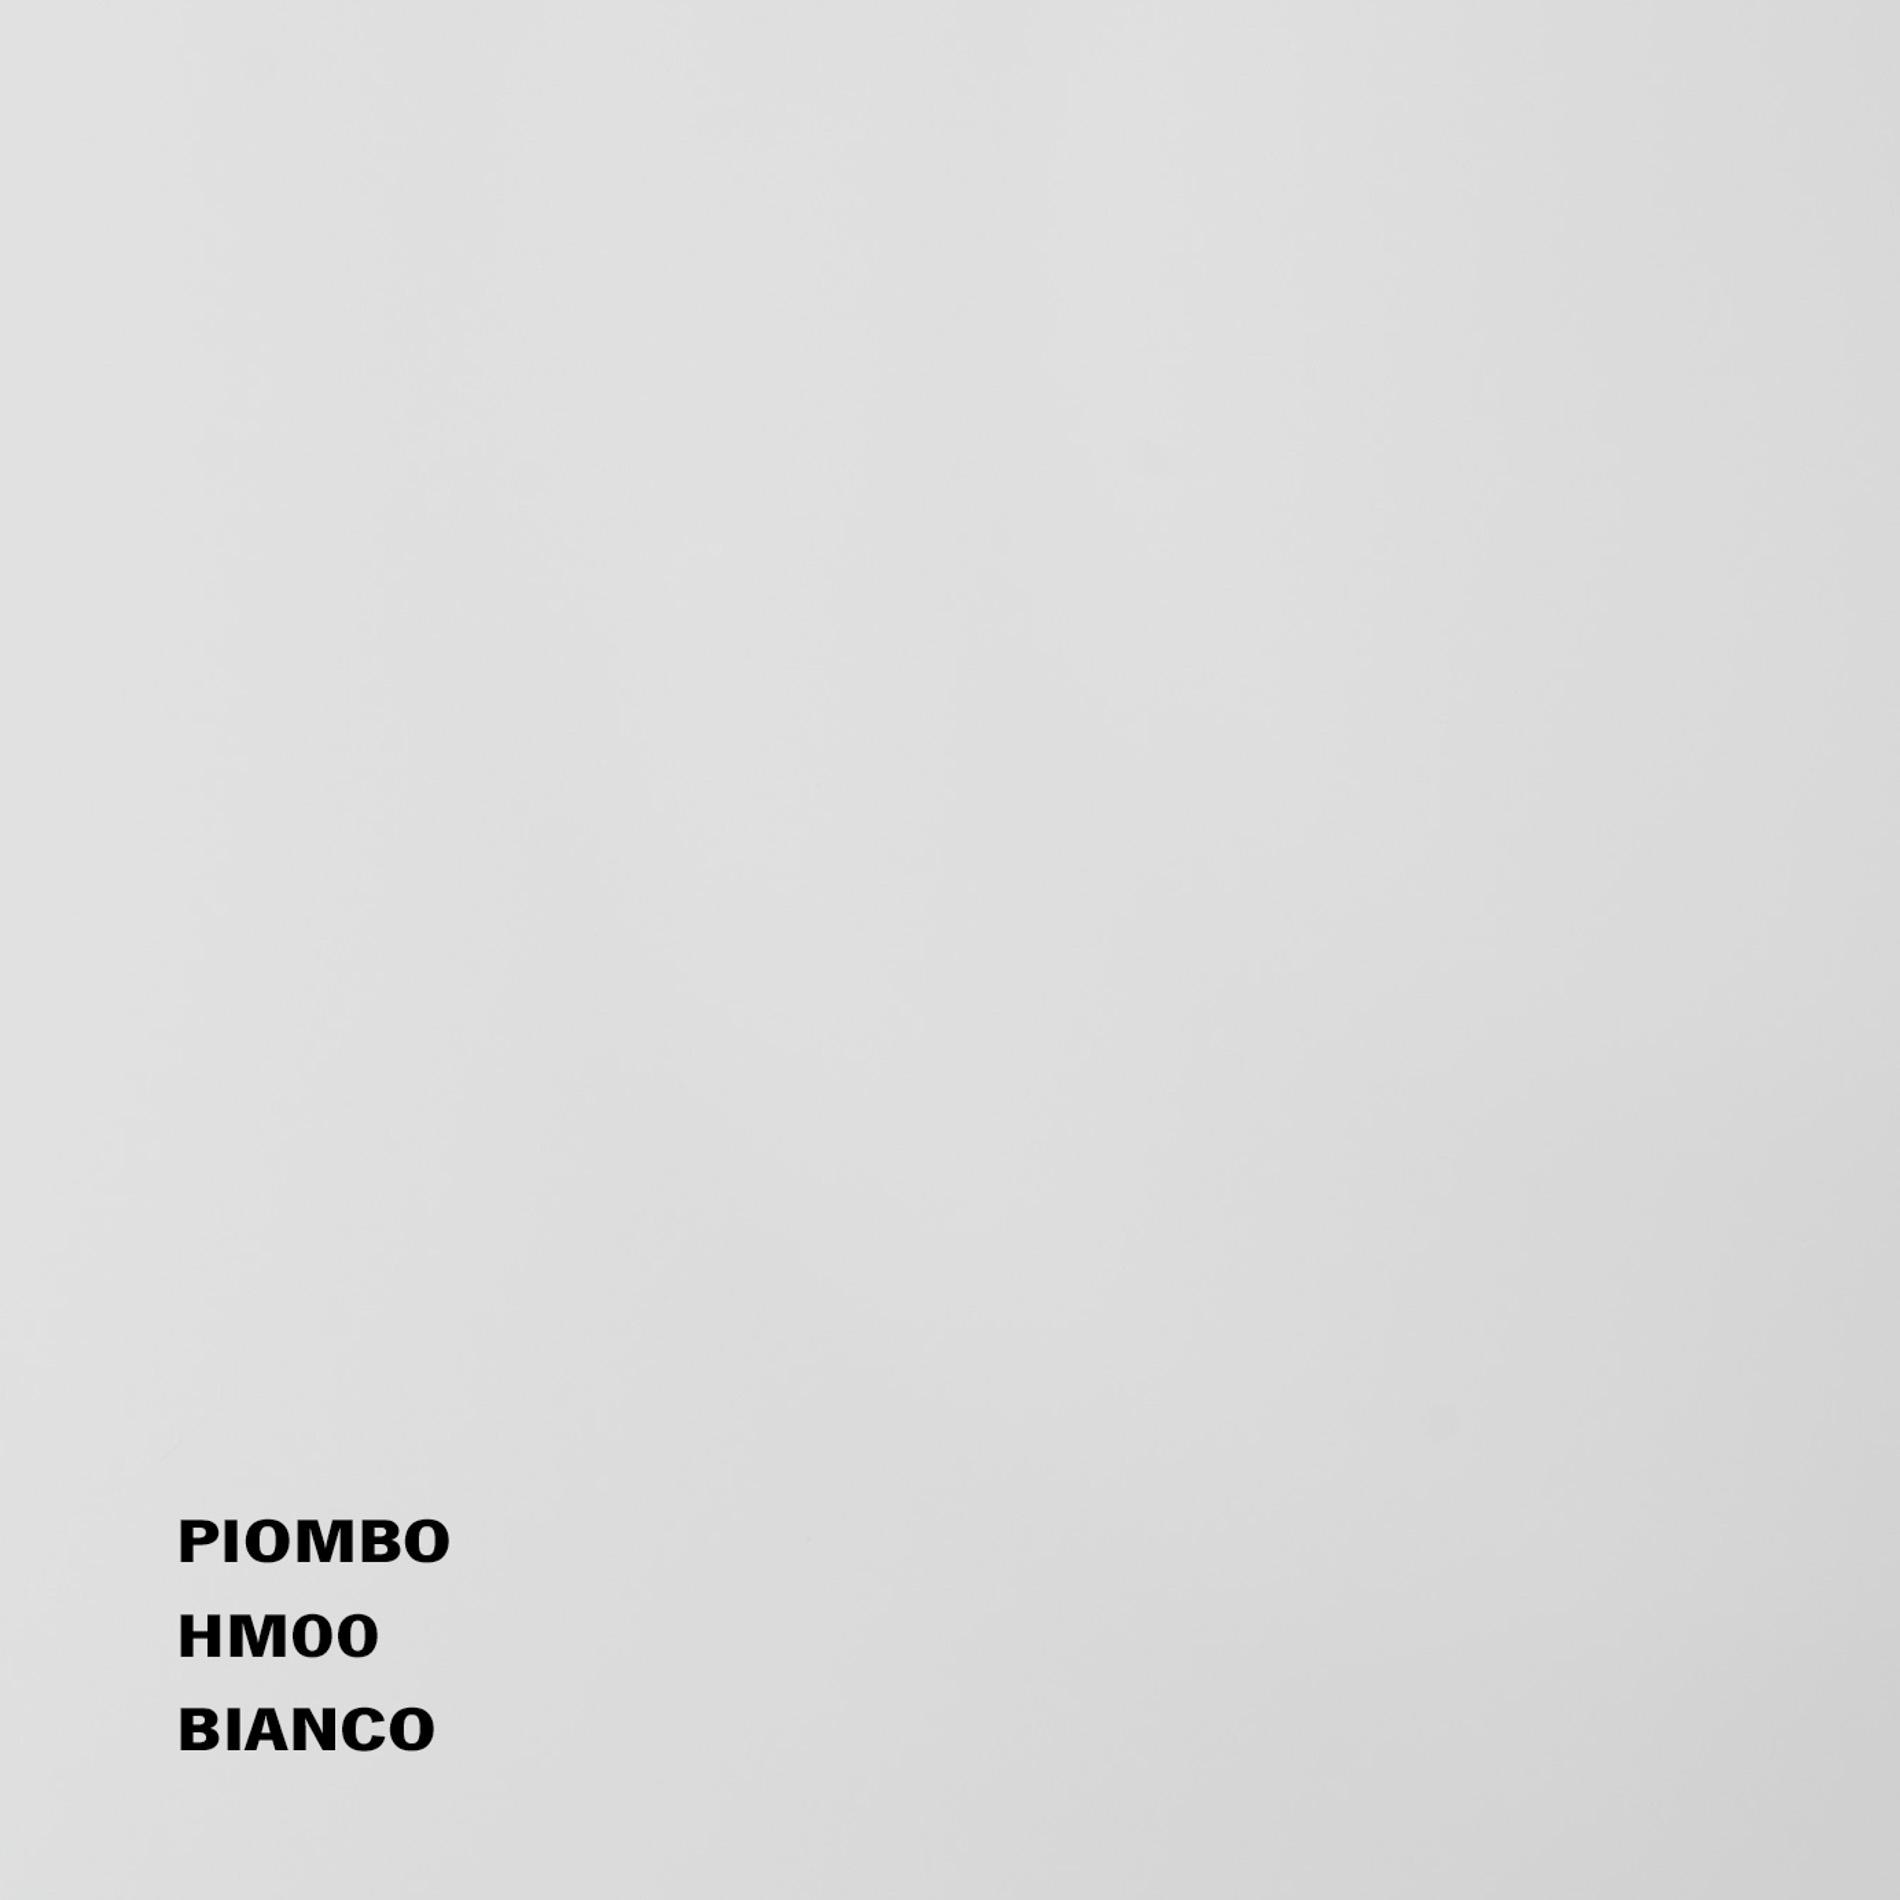 piombo_hm00